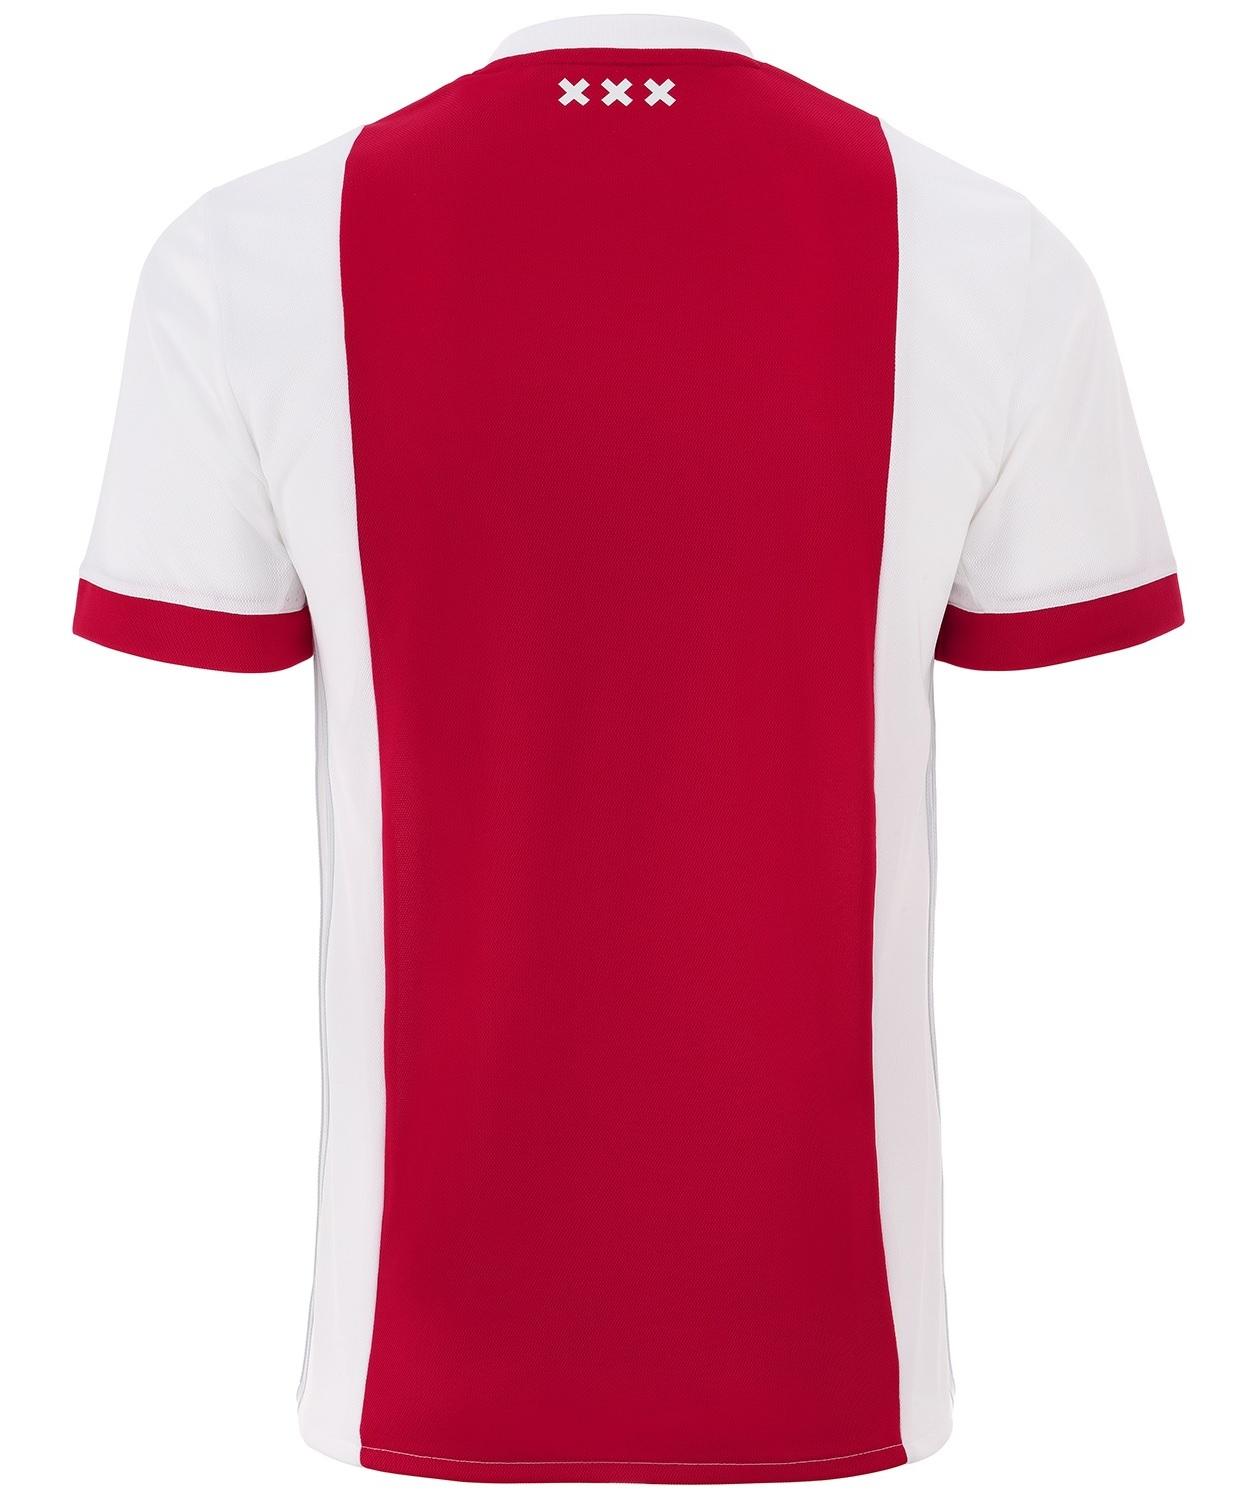 Ajax shirt 2018